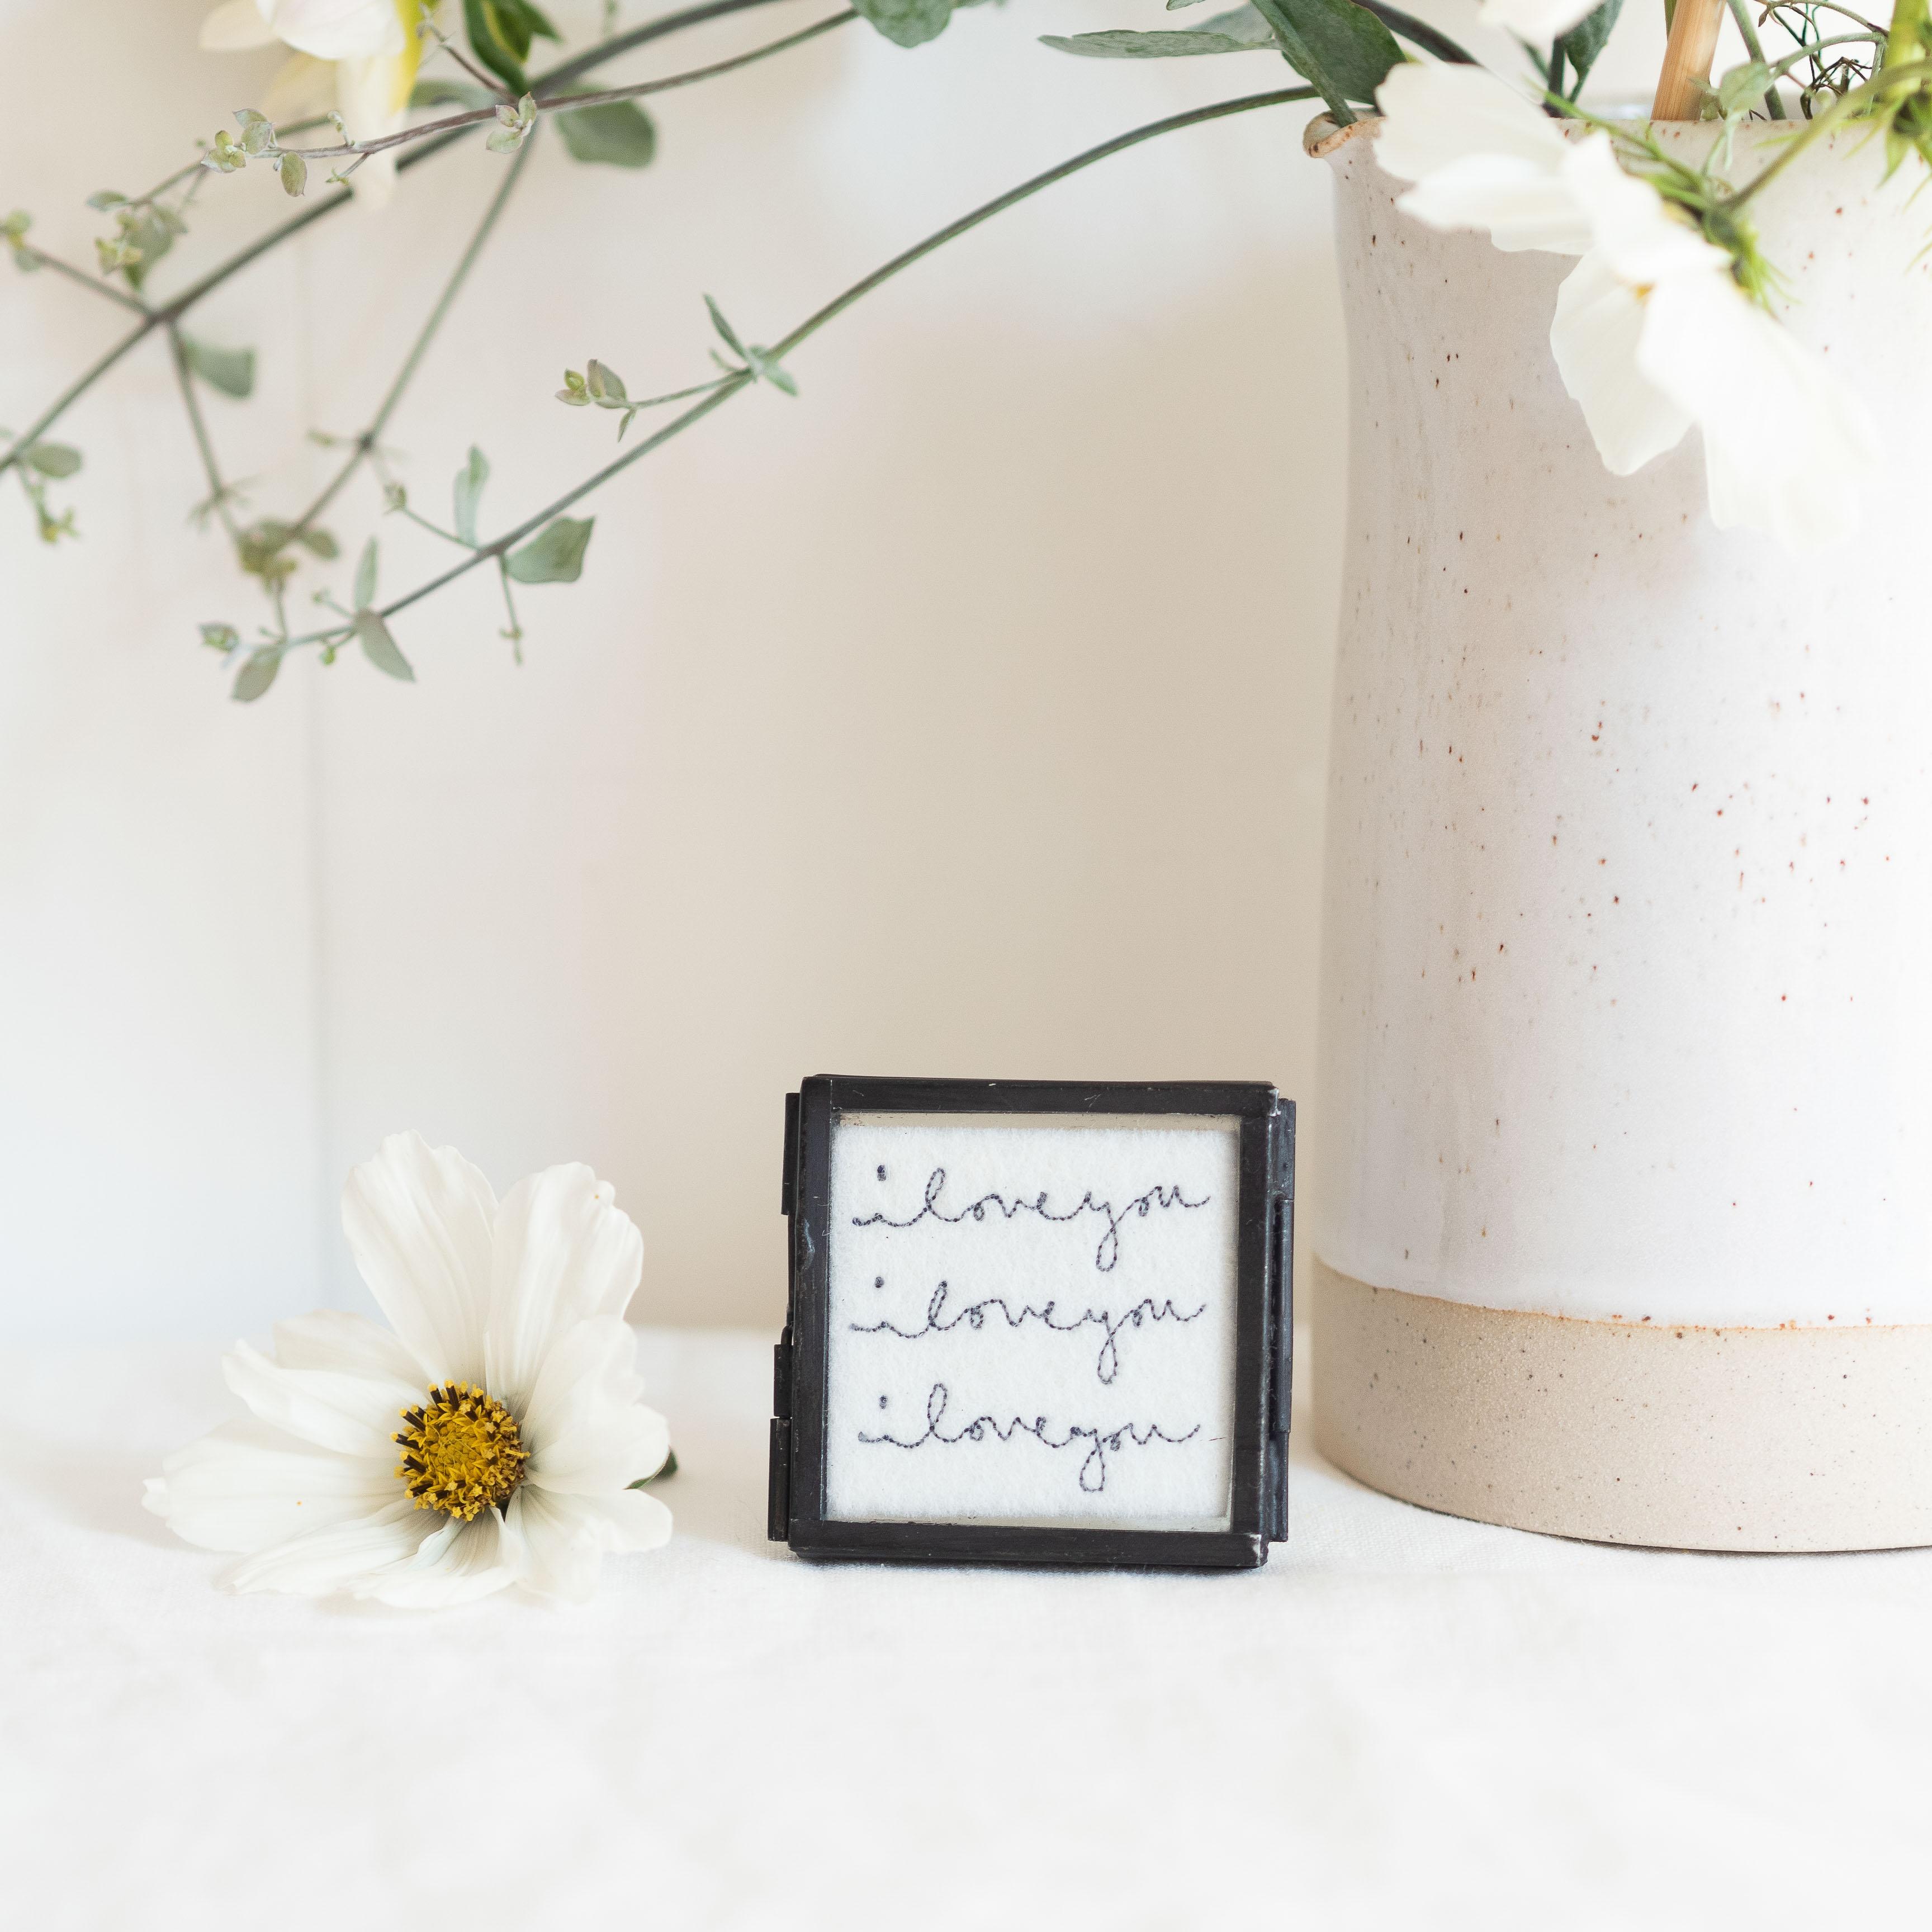 Custom Mini Framed Embroidery